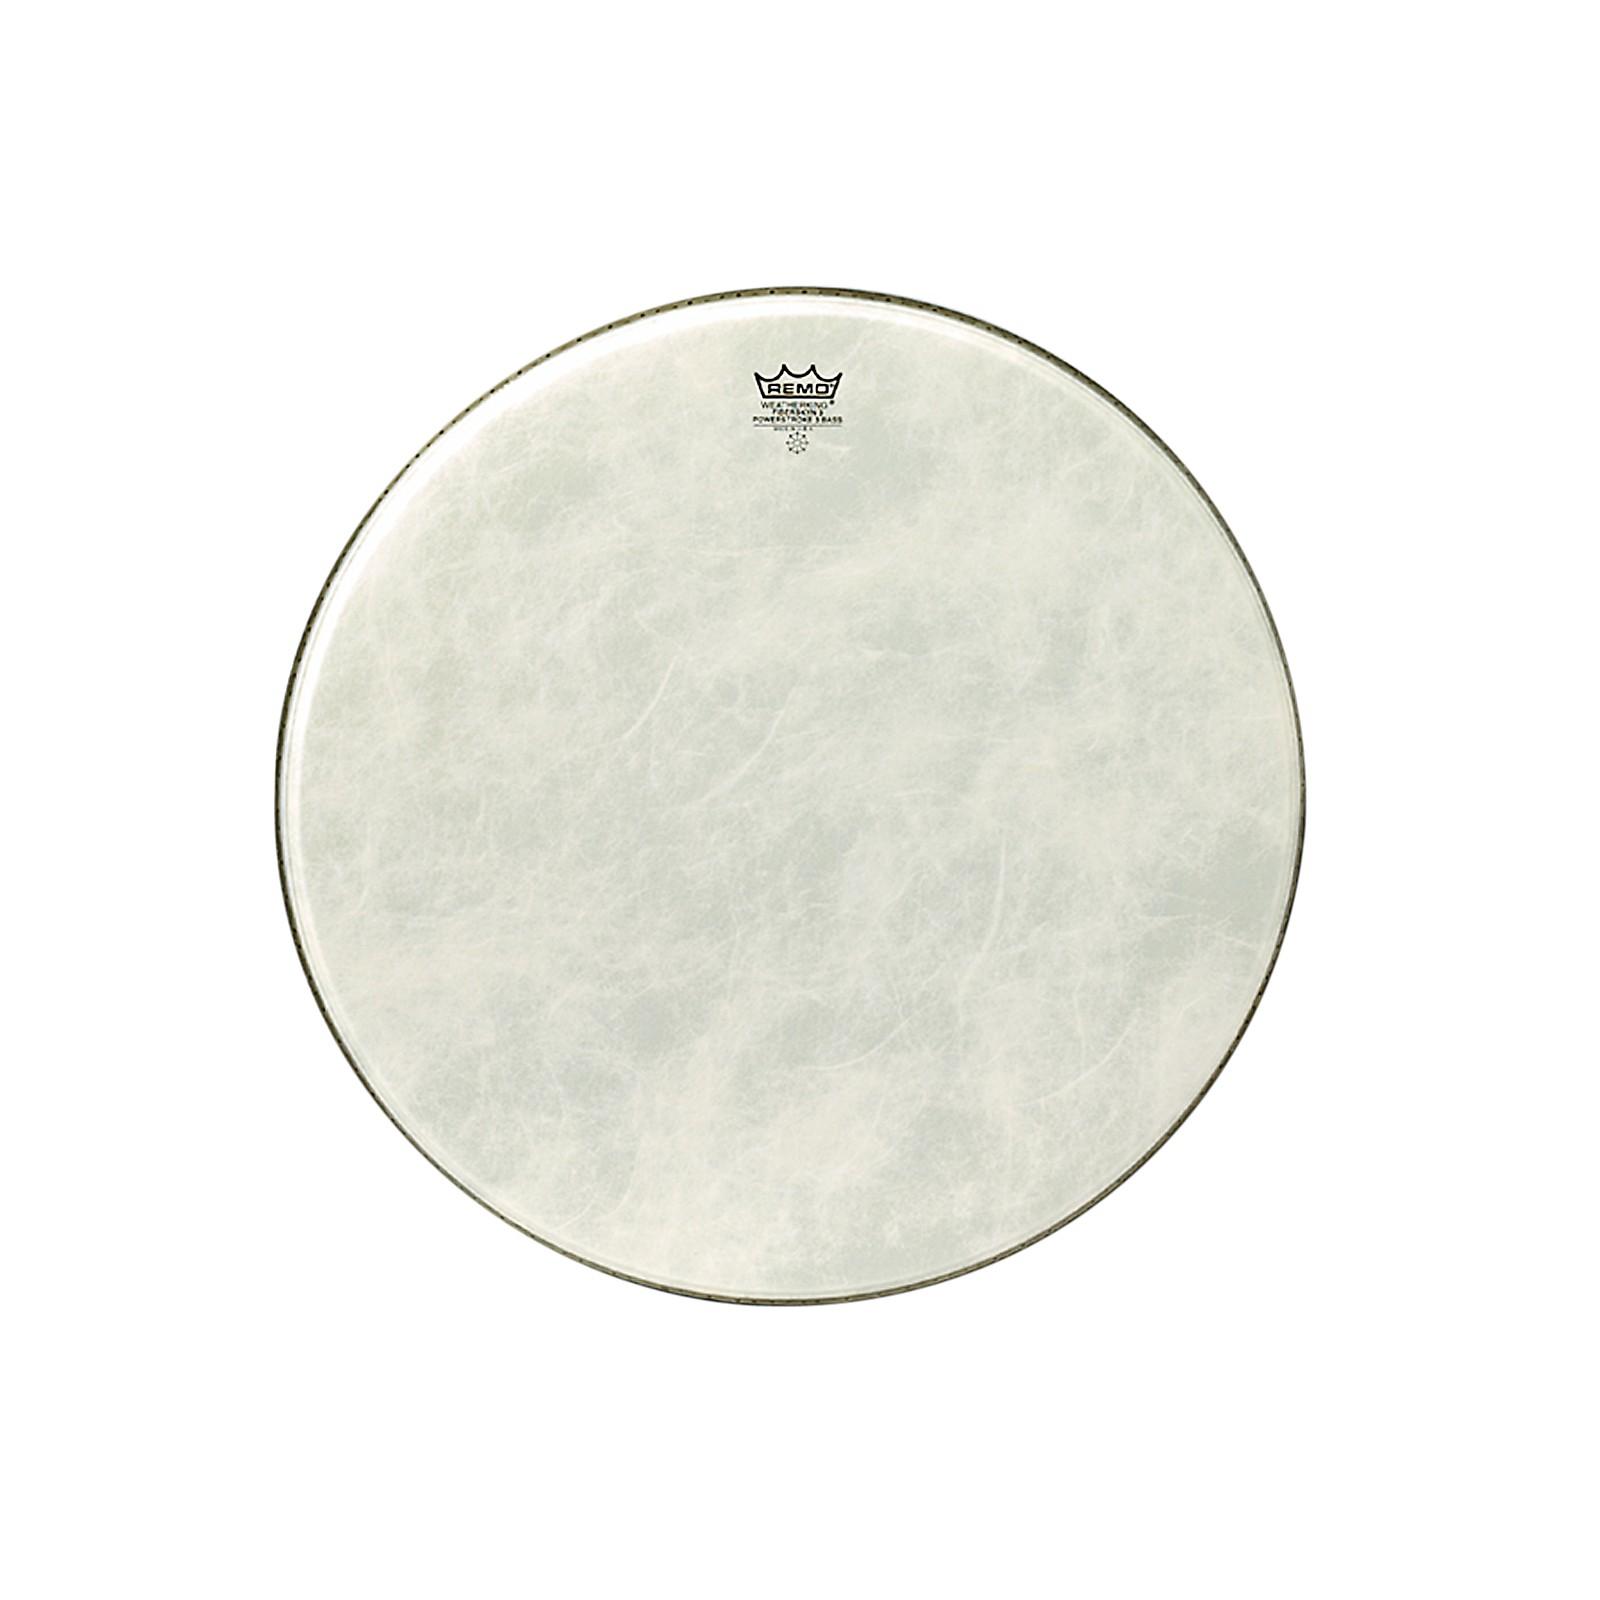 Remo Powerstroke 3 Simulated Calfskin Fiberskyn FA Bass Drumhead